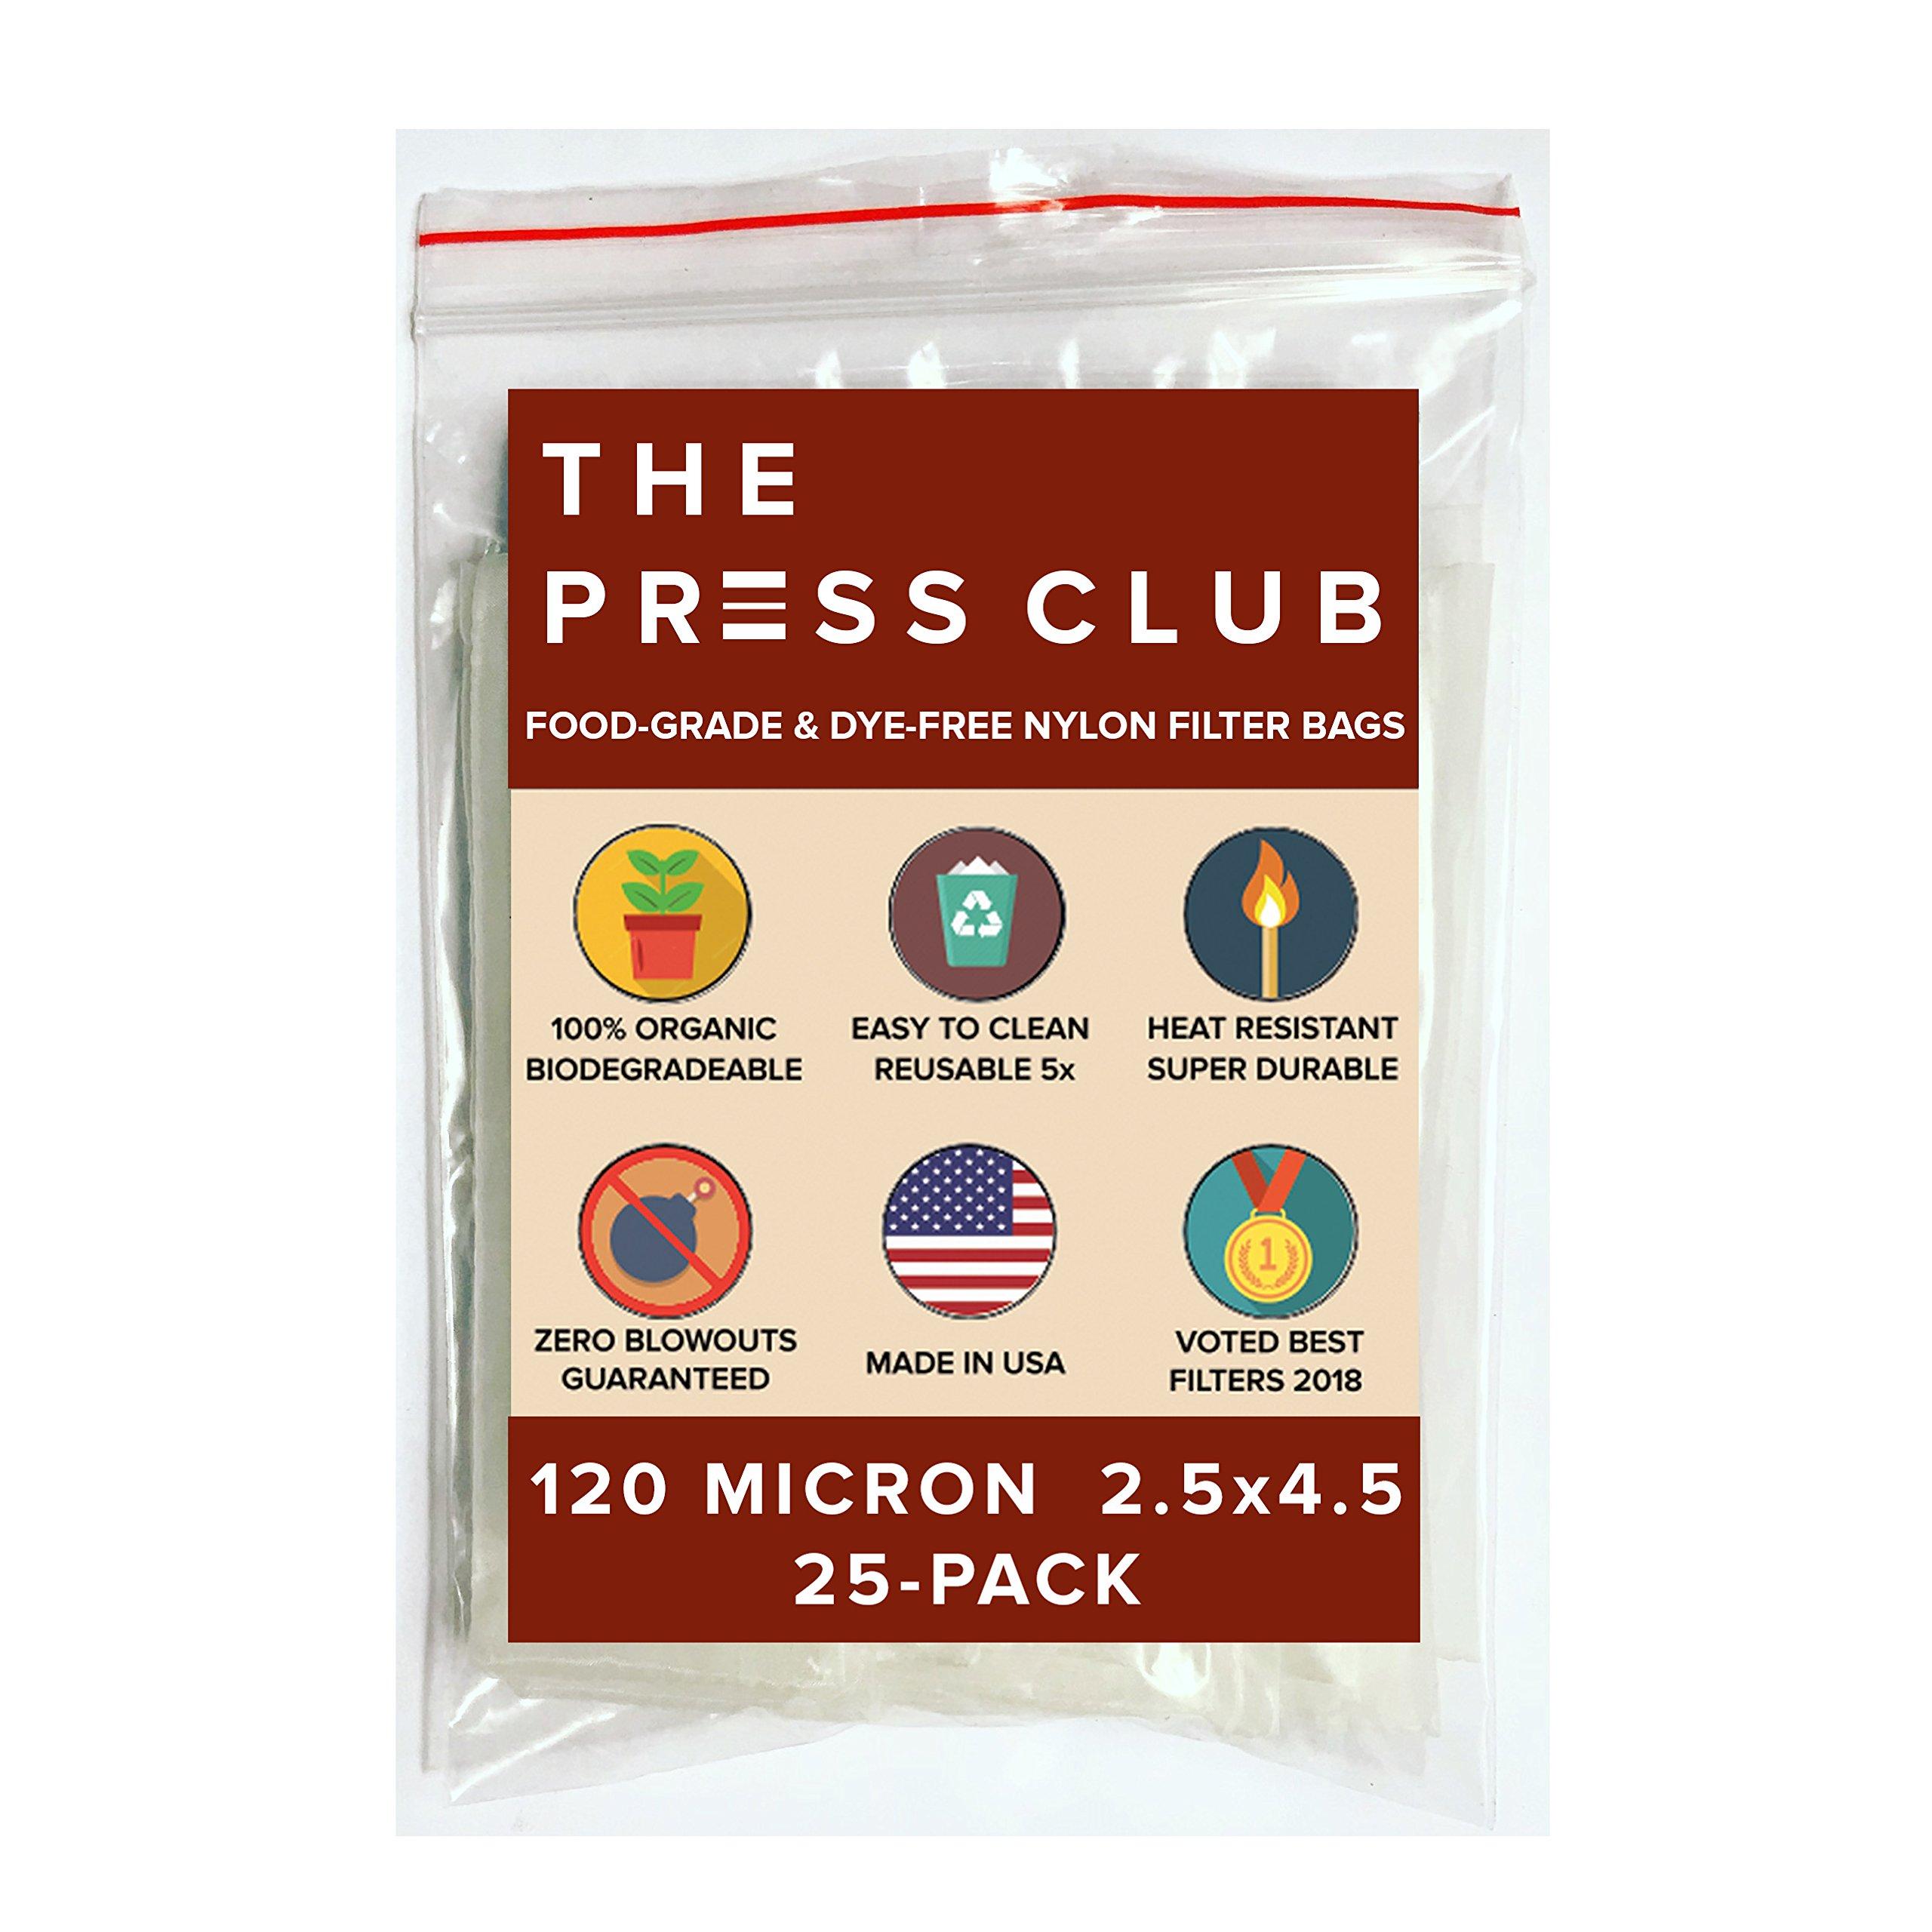 120 Micron   Premium Nylon Tea Filter Press Screen Bags   2.5'' x 4.5''   25 Pack   Zero Blowout Guarantee   All Micron & Sizes Available